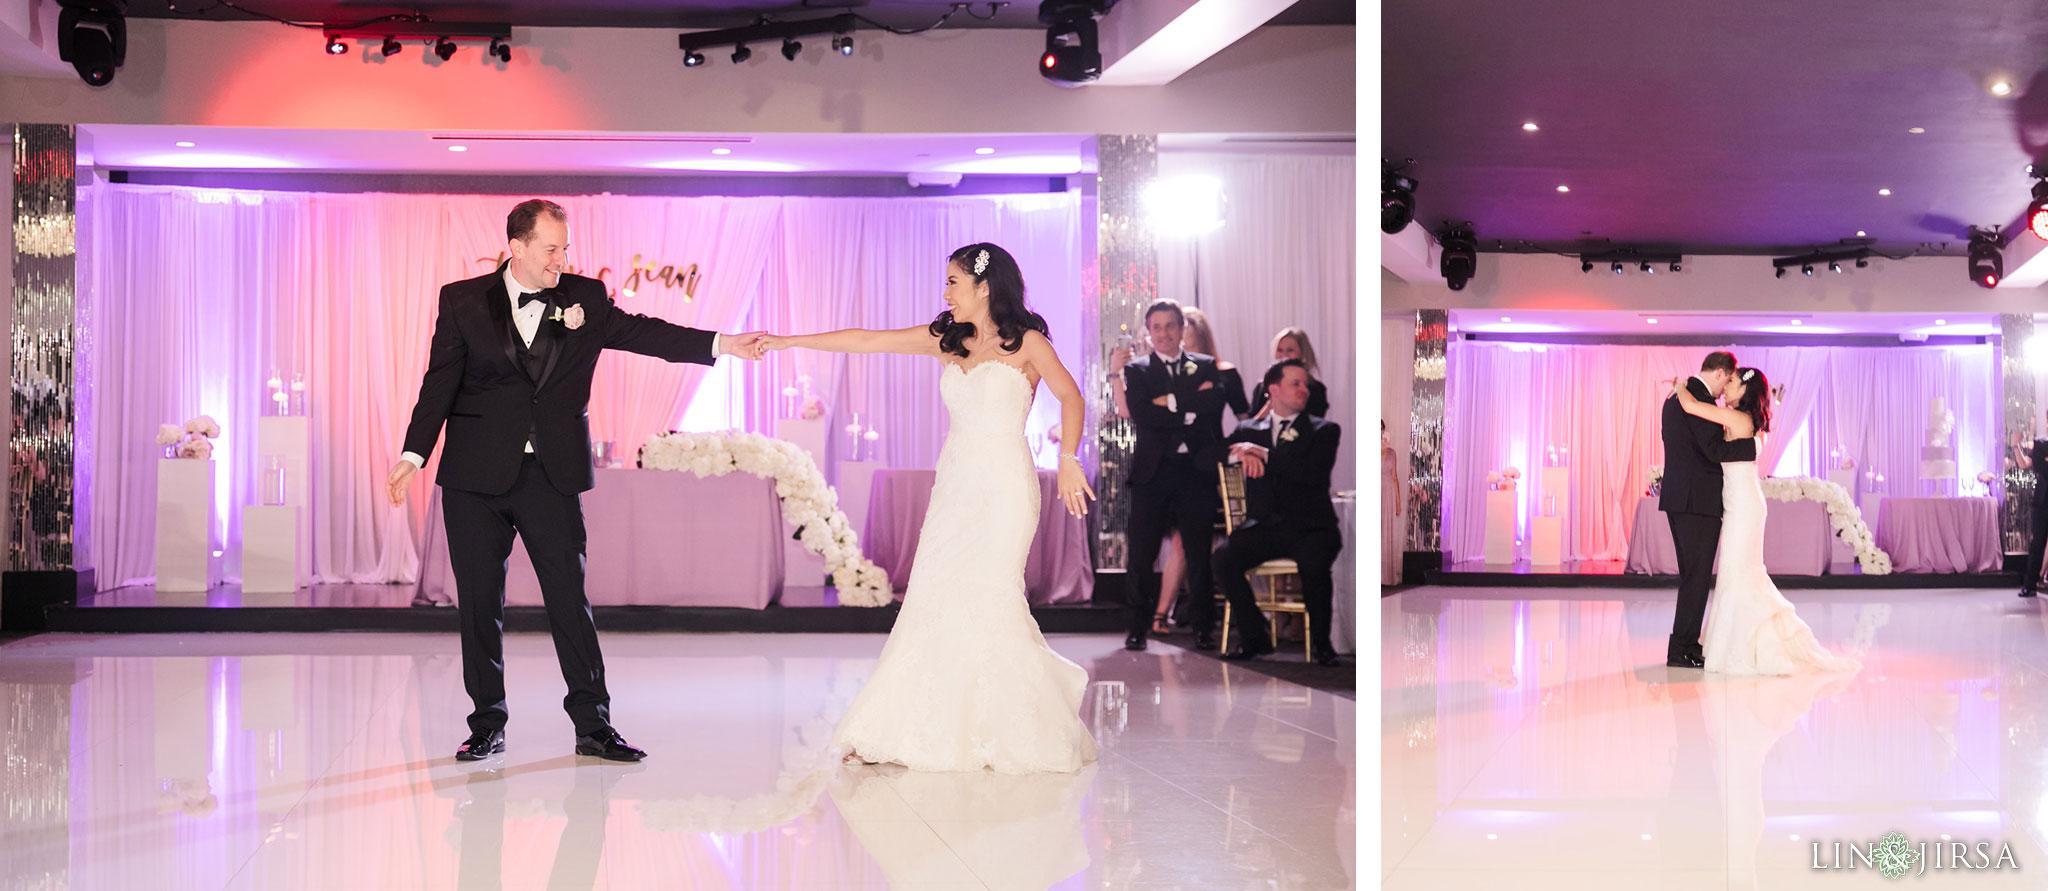 37 vertigo banquet hall glendale wedding photography